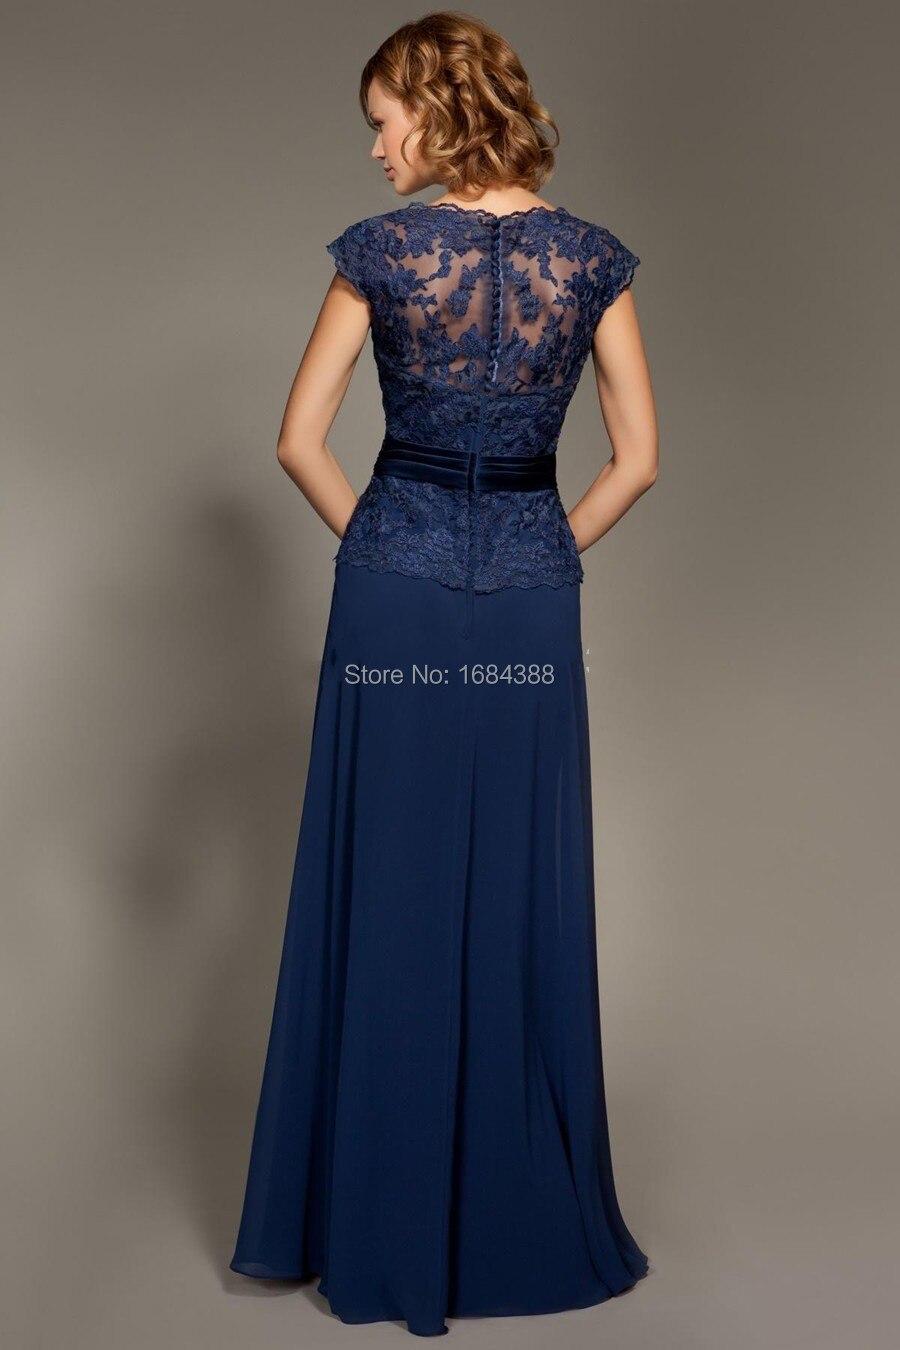 62abe0104a3 Navy Evening Maxi Dress Uk - Gomes Weine AG